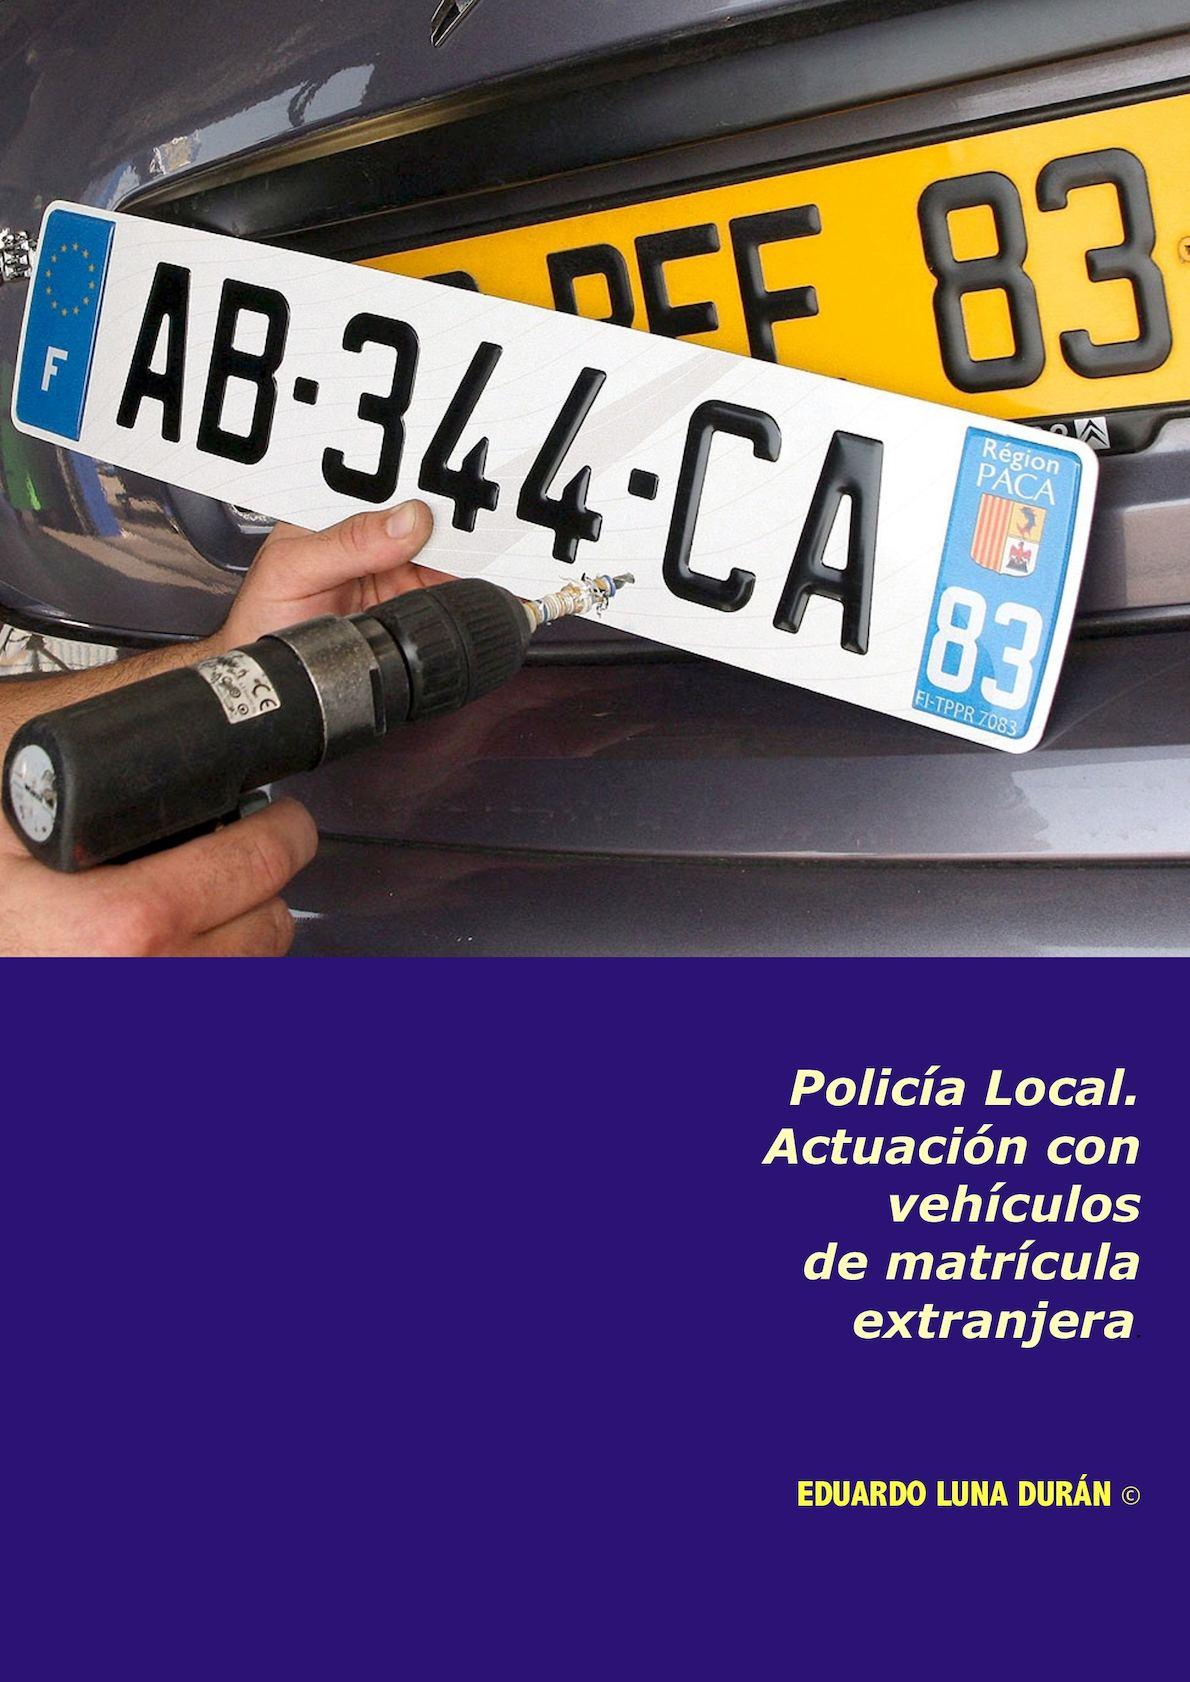 Policía Local Actuación Con Vehículos De Matricula Extranjera